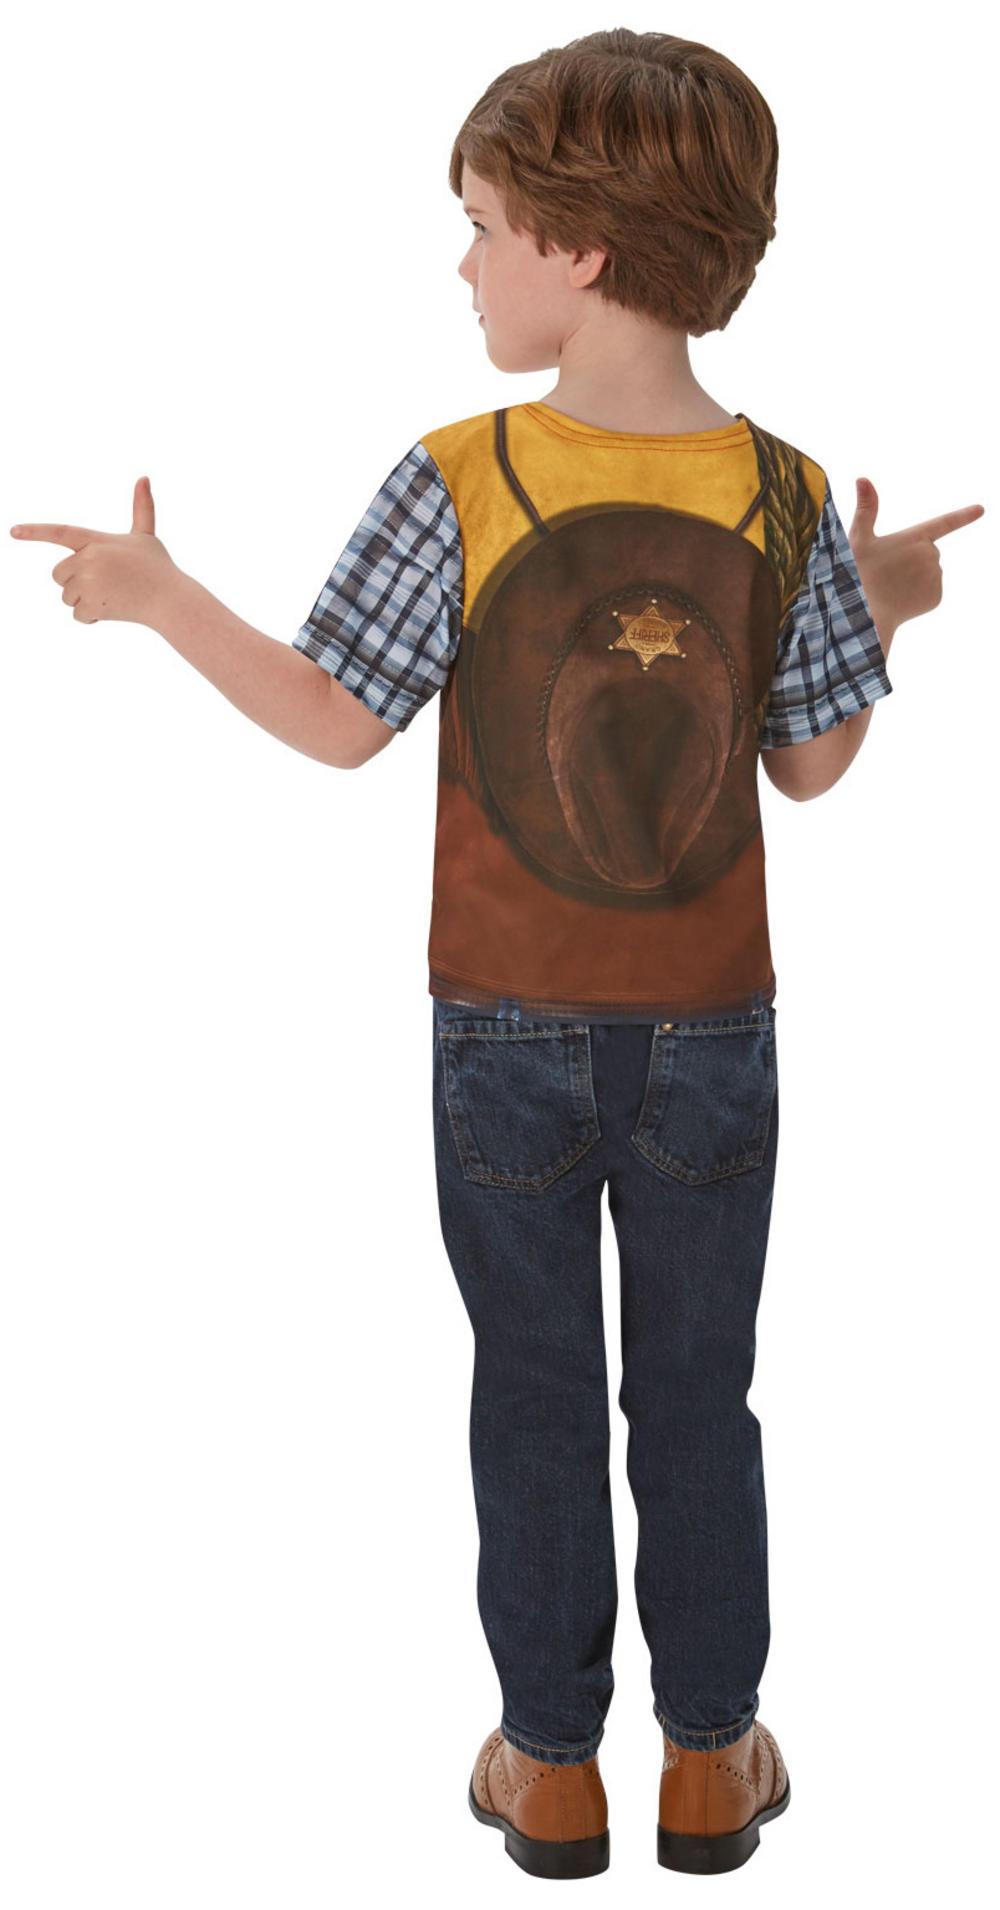 Cowboy T shirt TvBoekenEn Filmkostuums Mega Kinderkleding T3lK1cFuJ